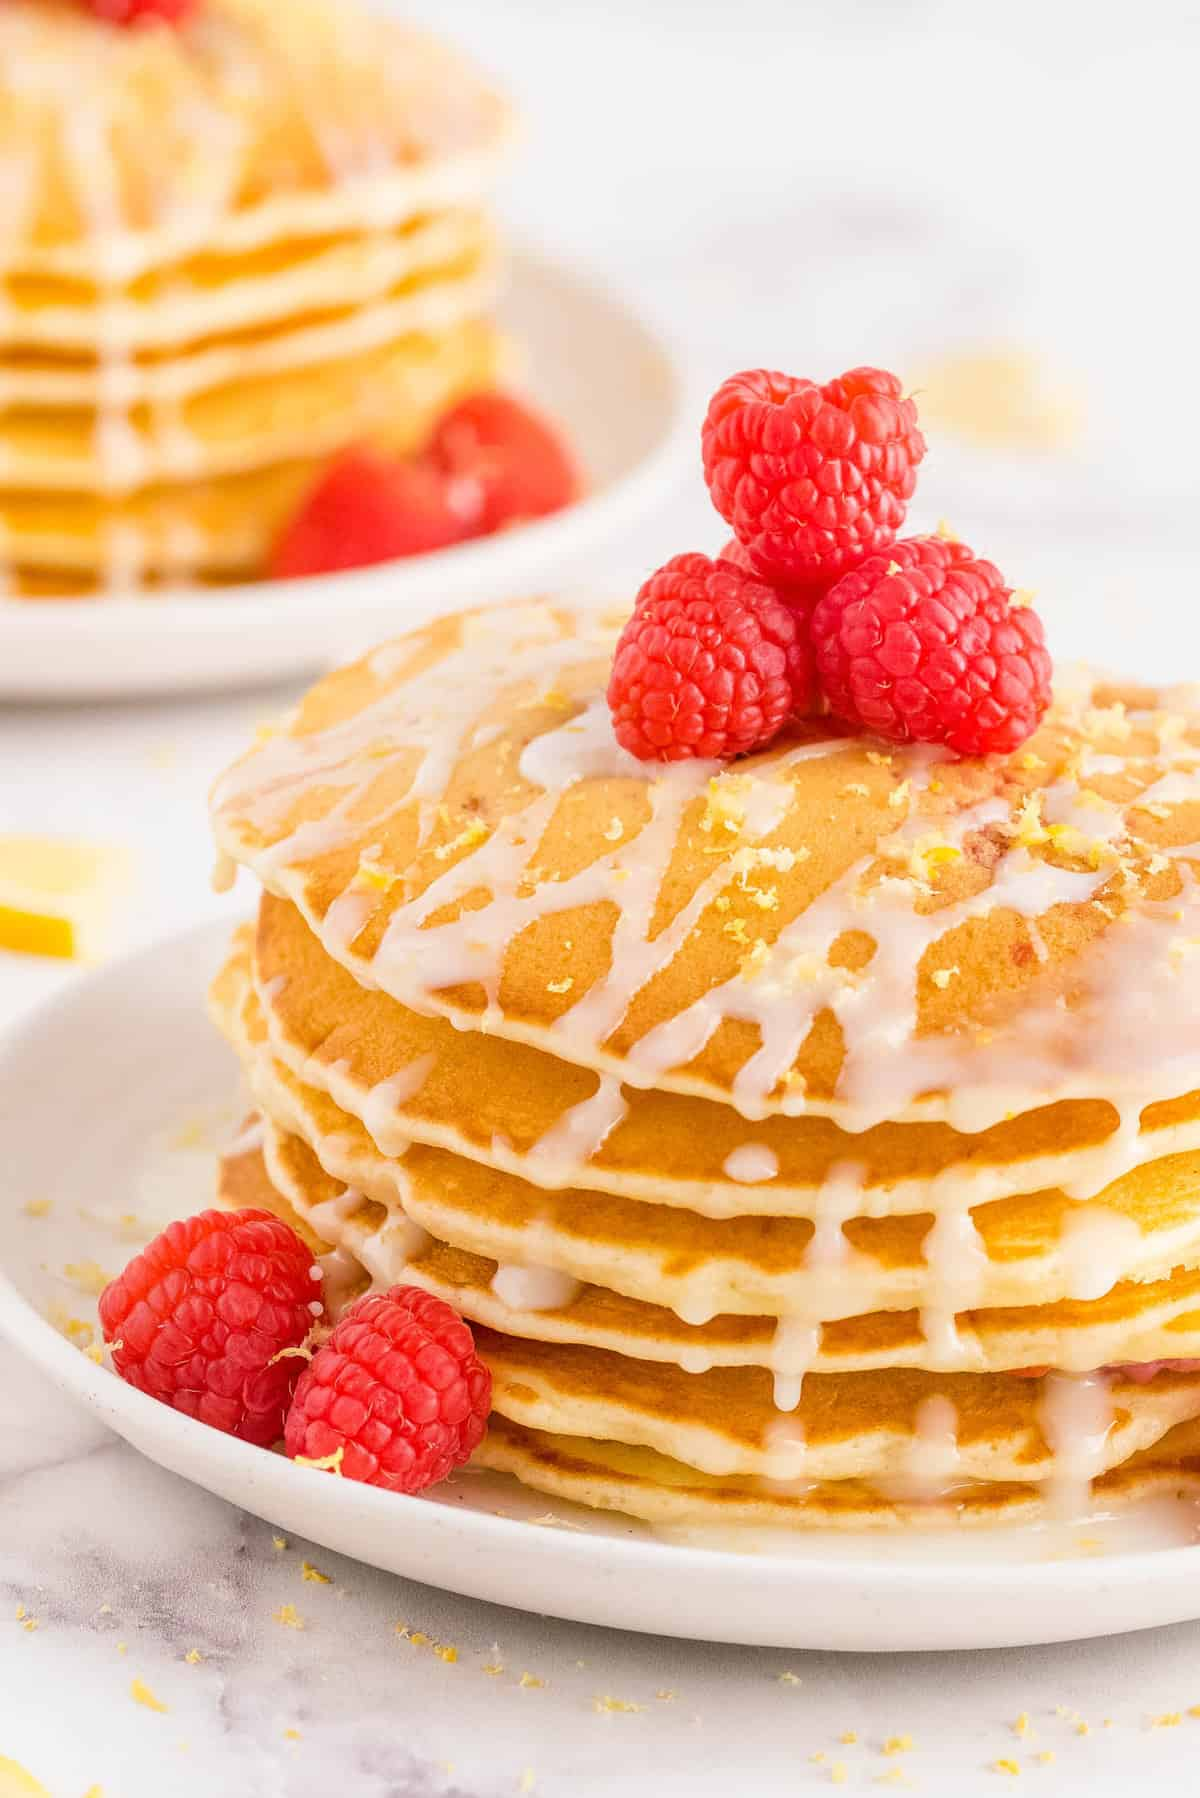 Stack of pancakes topped with fresh raspberries, lemon glaze, and lemon zest.